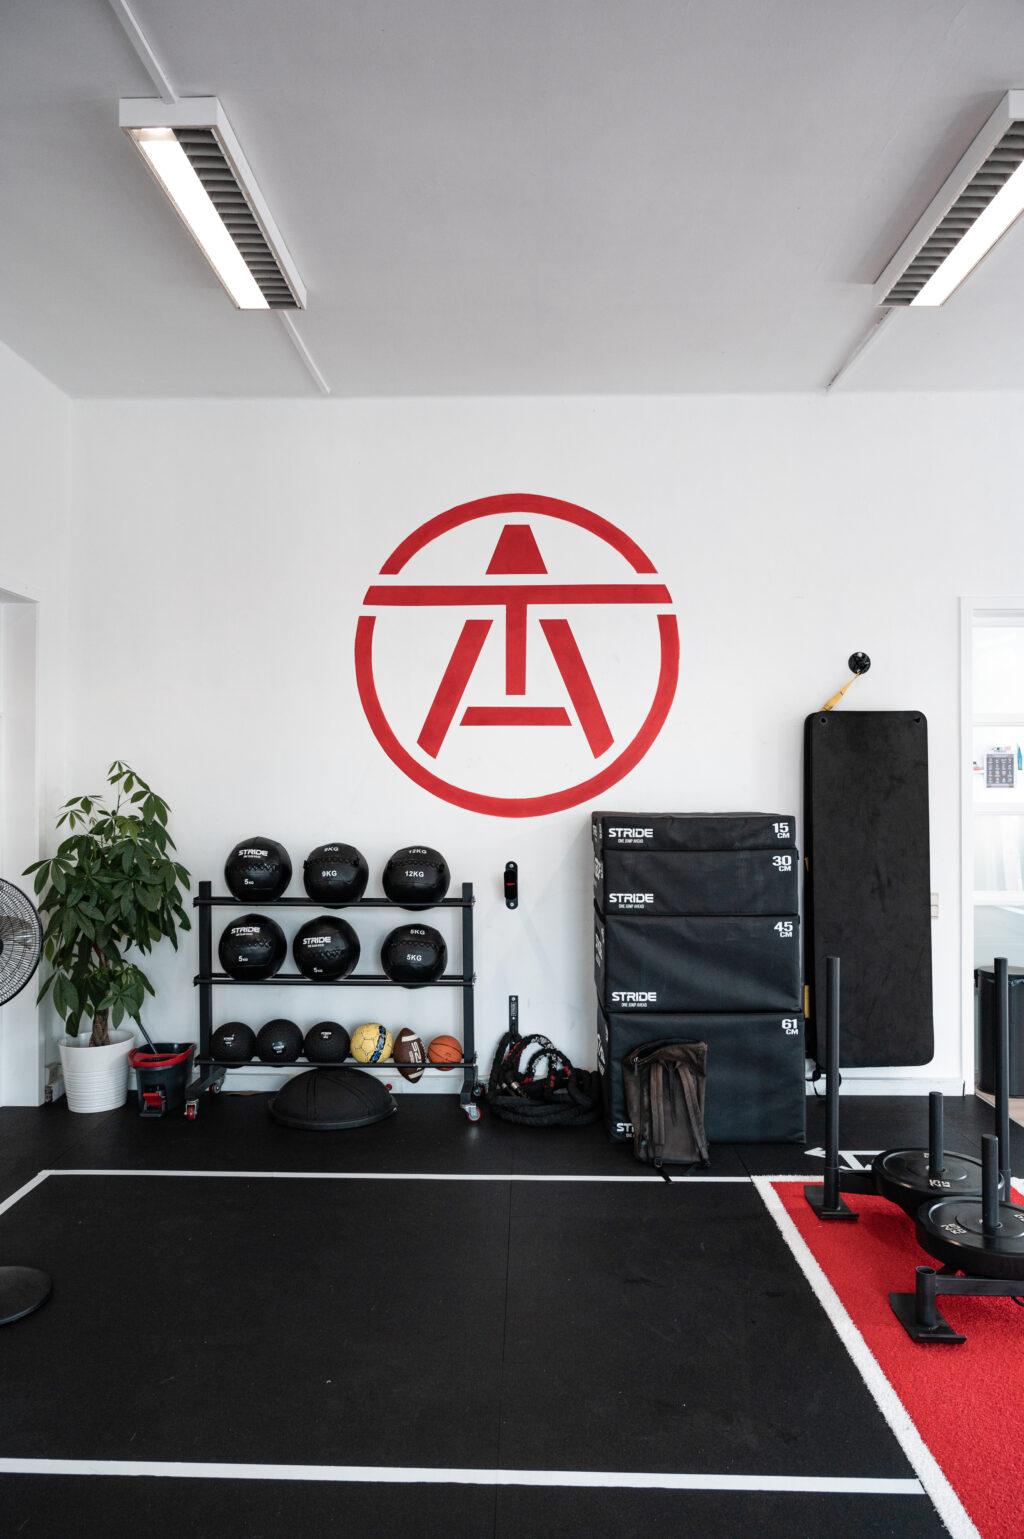 20210716 Art of Training 4